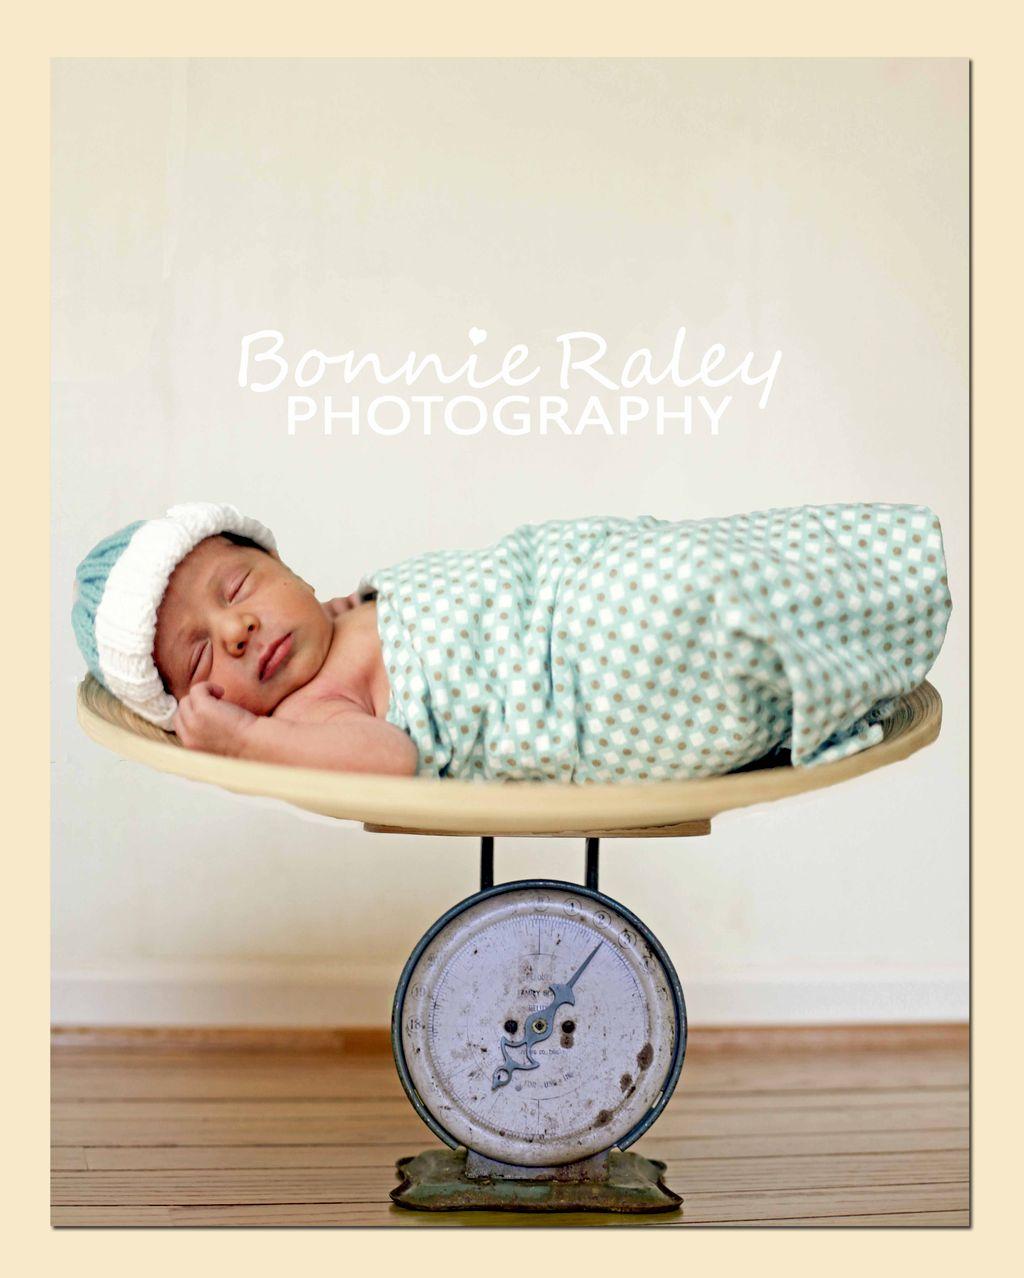 Bonnie Raley Photography